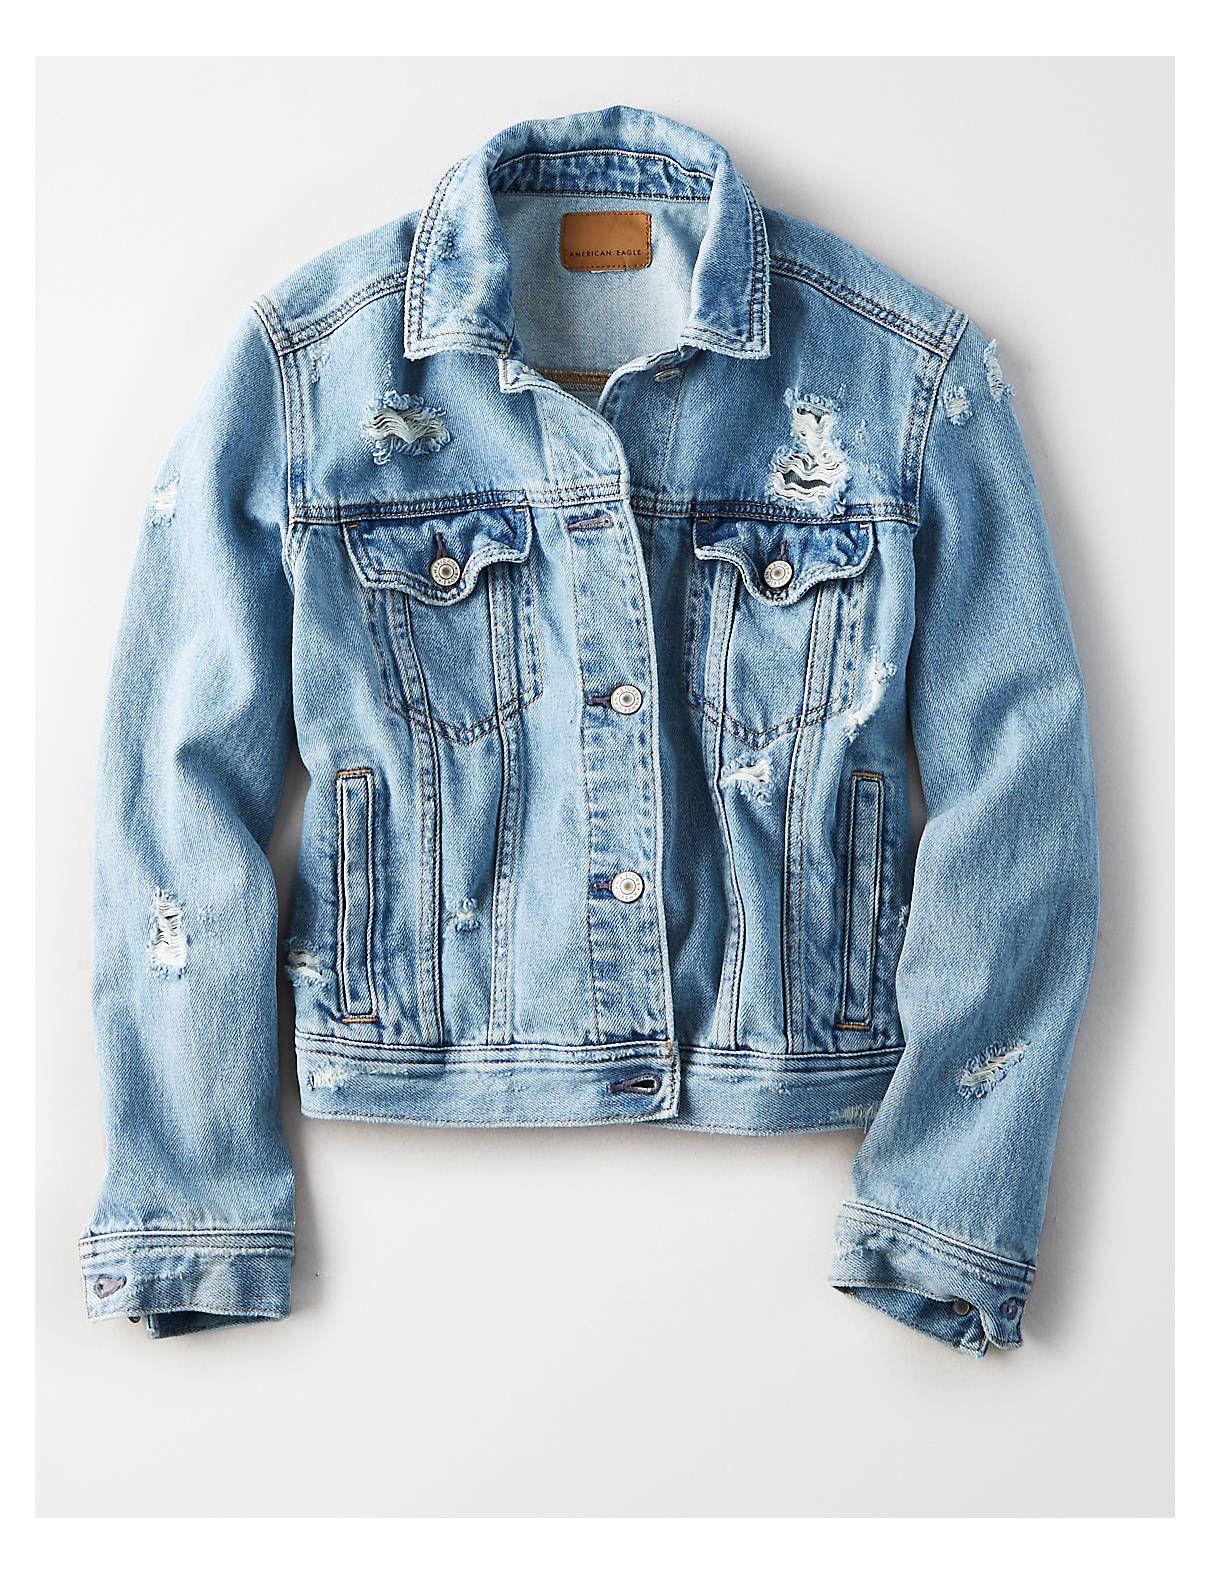 Ae Classic Denim Jacket Blue American Eagle Outfitters Classic Denim Jacket Light Denim Jacket Denim Jacket [ 1575 x 1211 Pixel ]